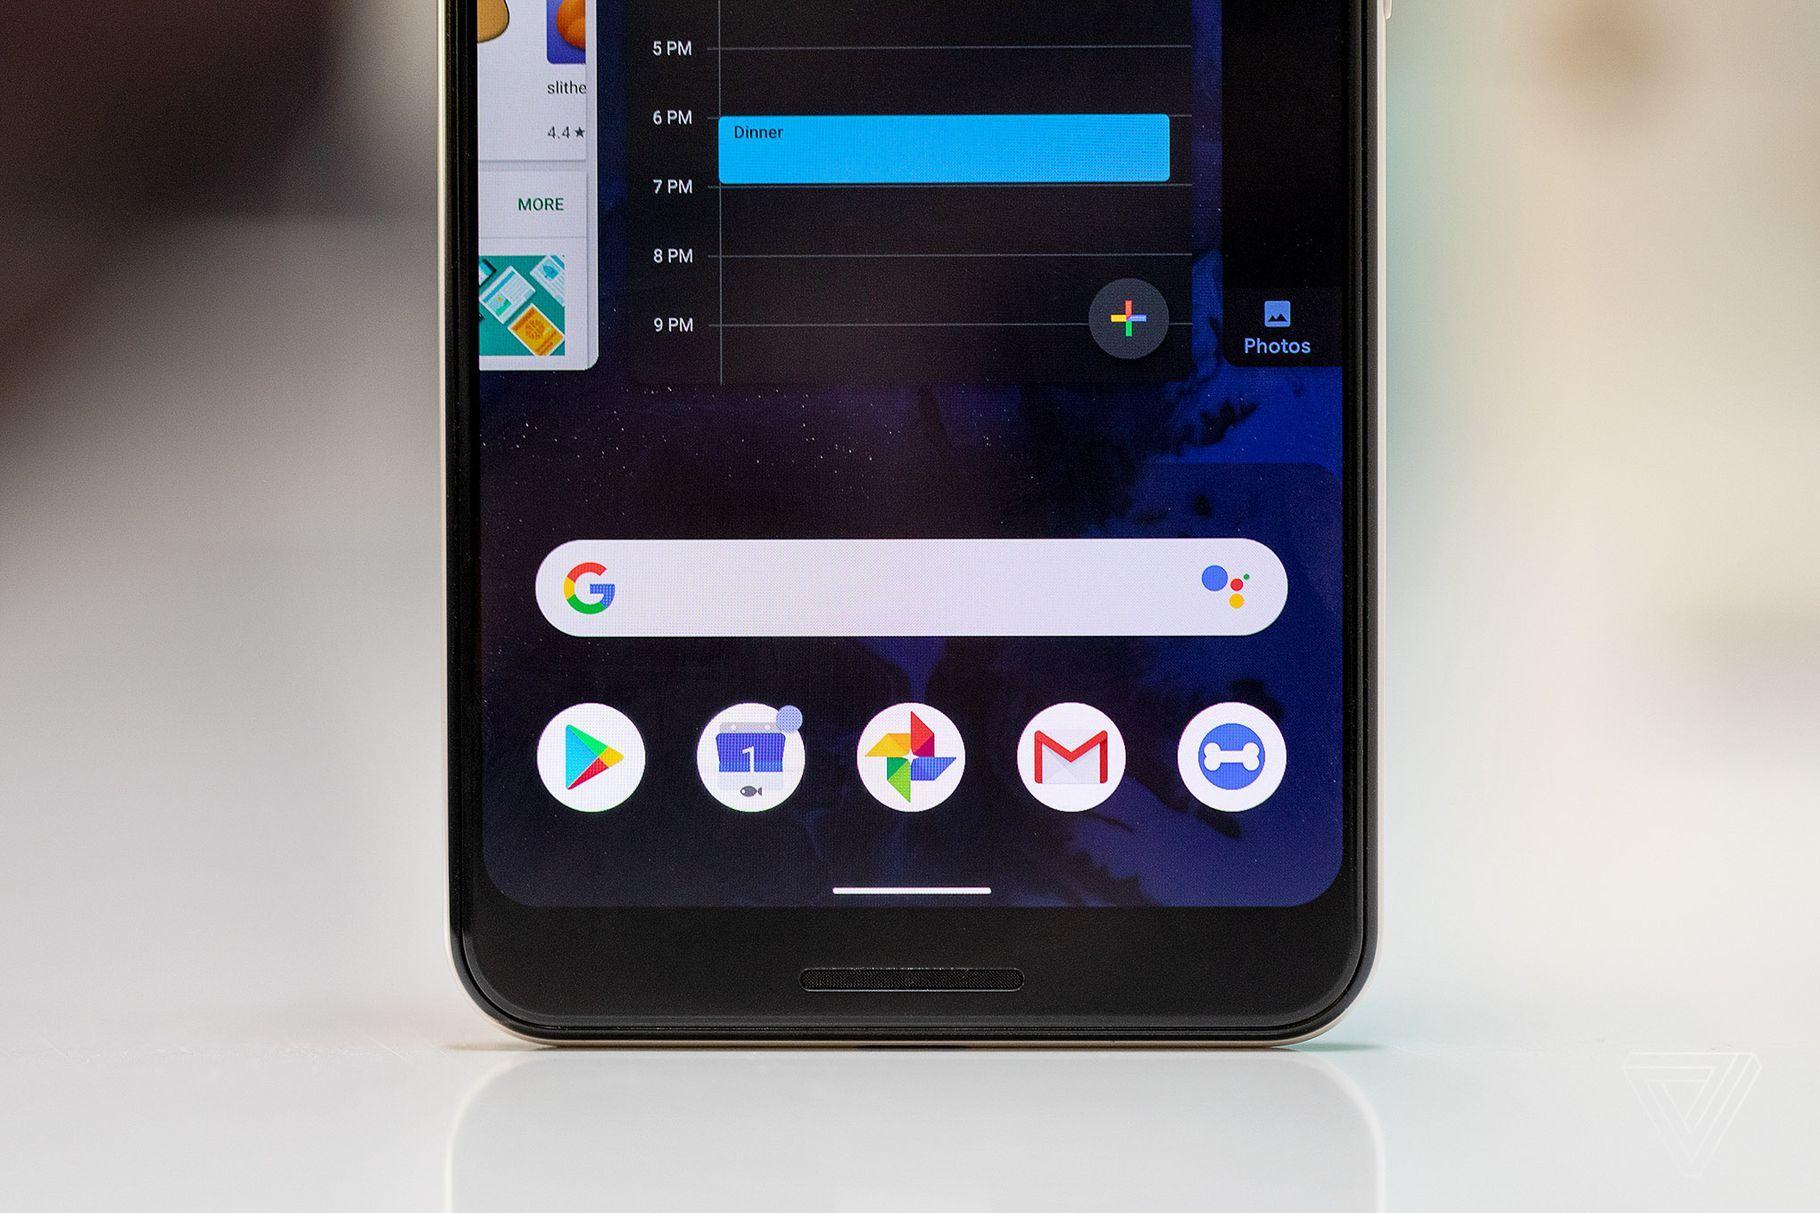 Android Q改进手势 从屏幕两侧向内滑动即可后退